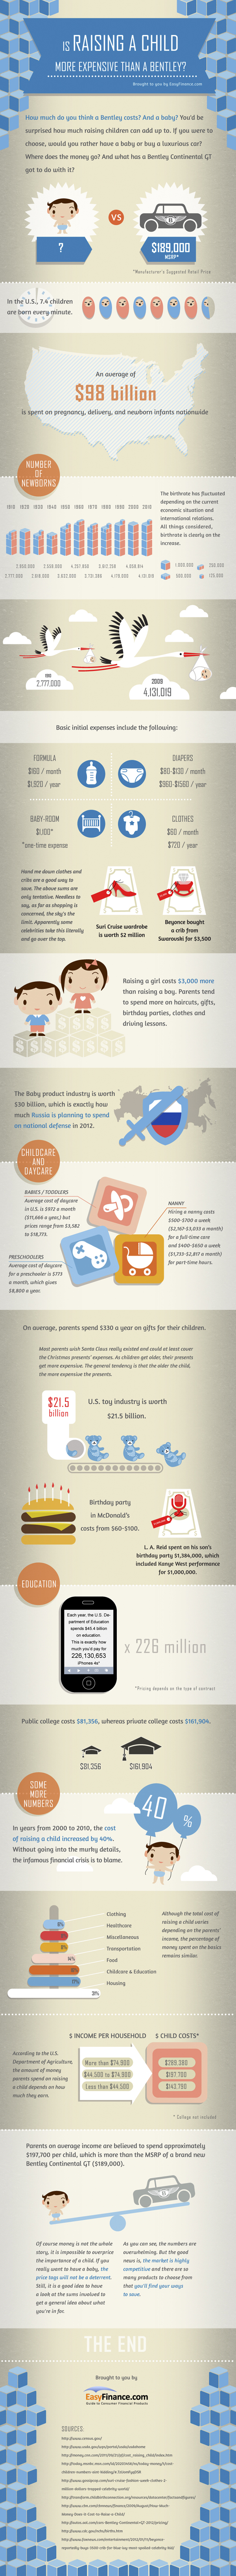 Raising-a-Child-Cost